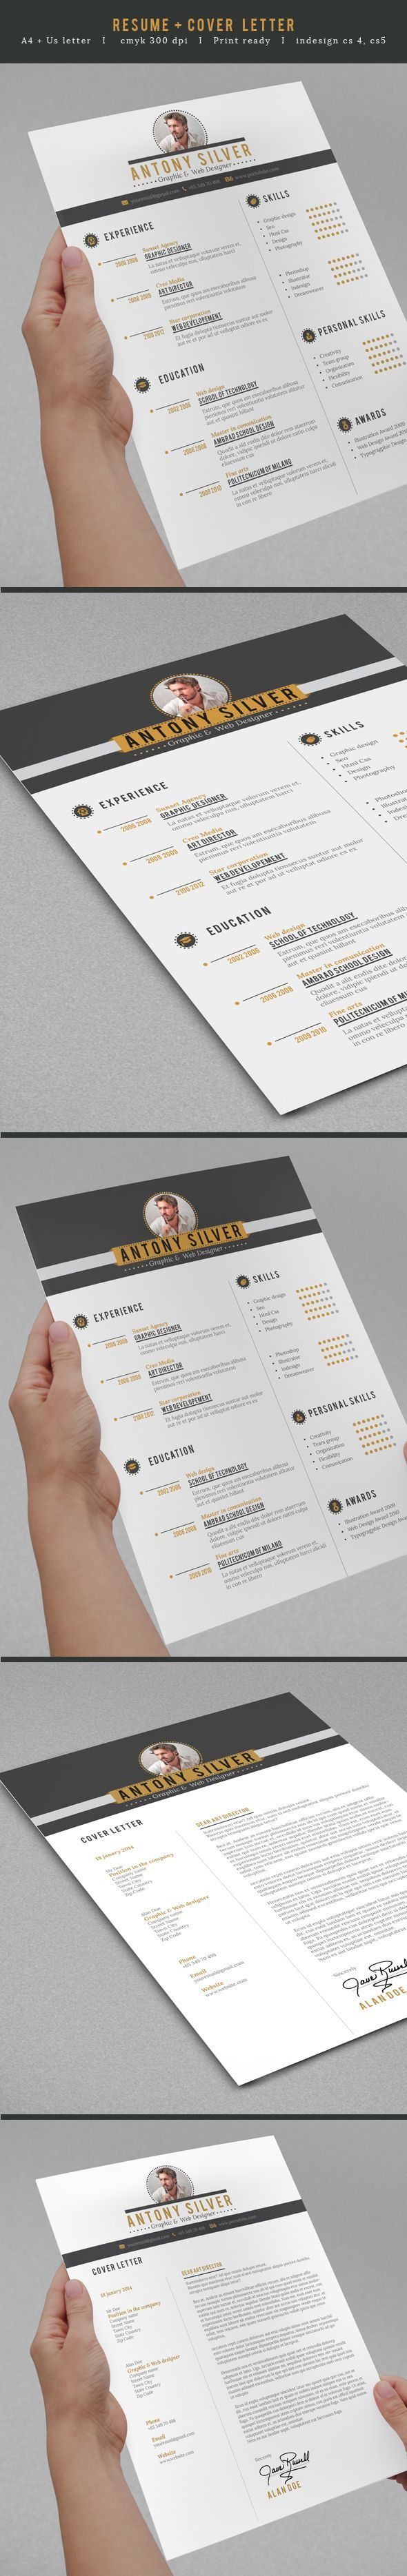 50 best ✪ design infographics and online cv portfolio images on